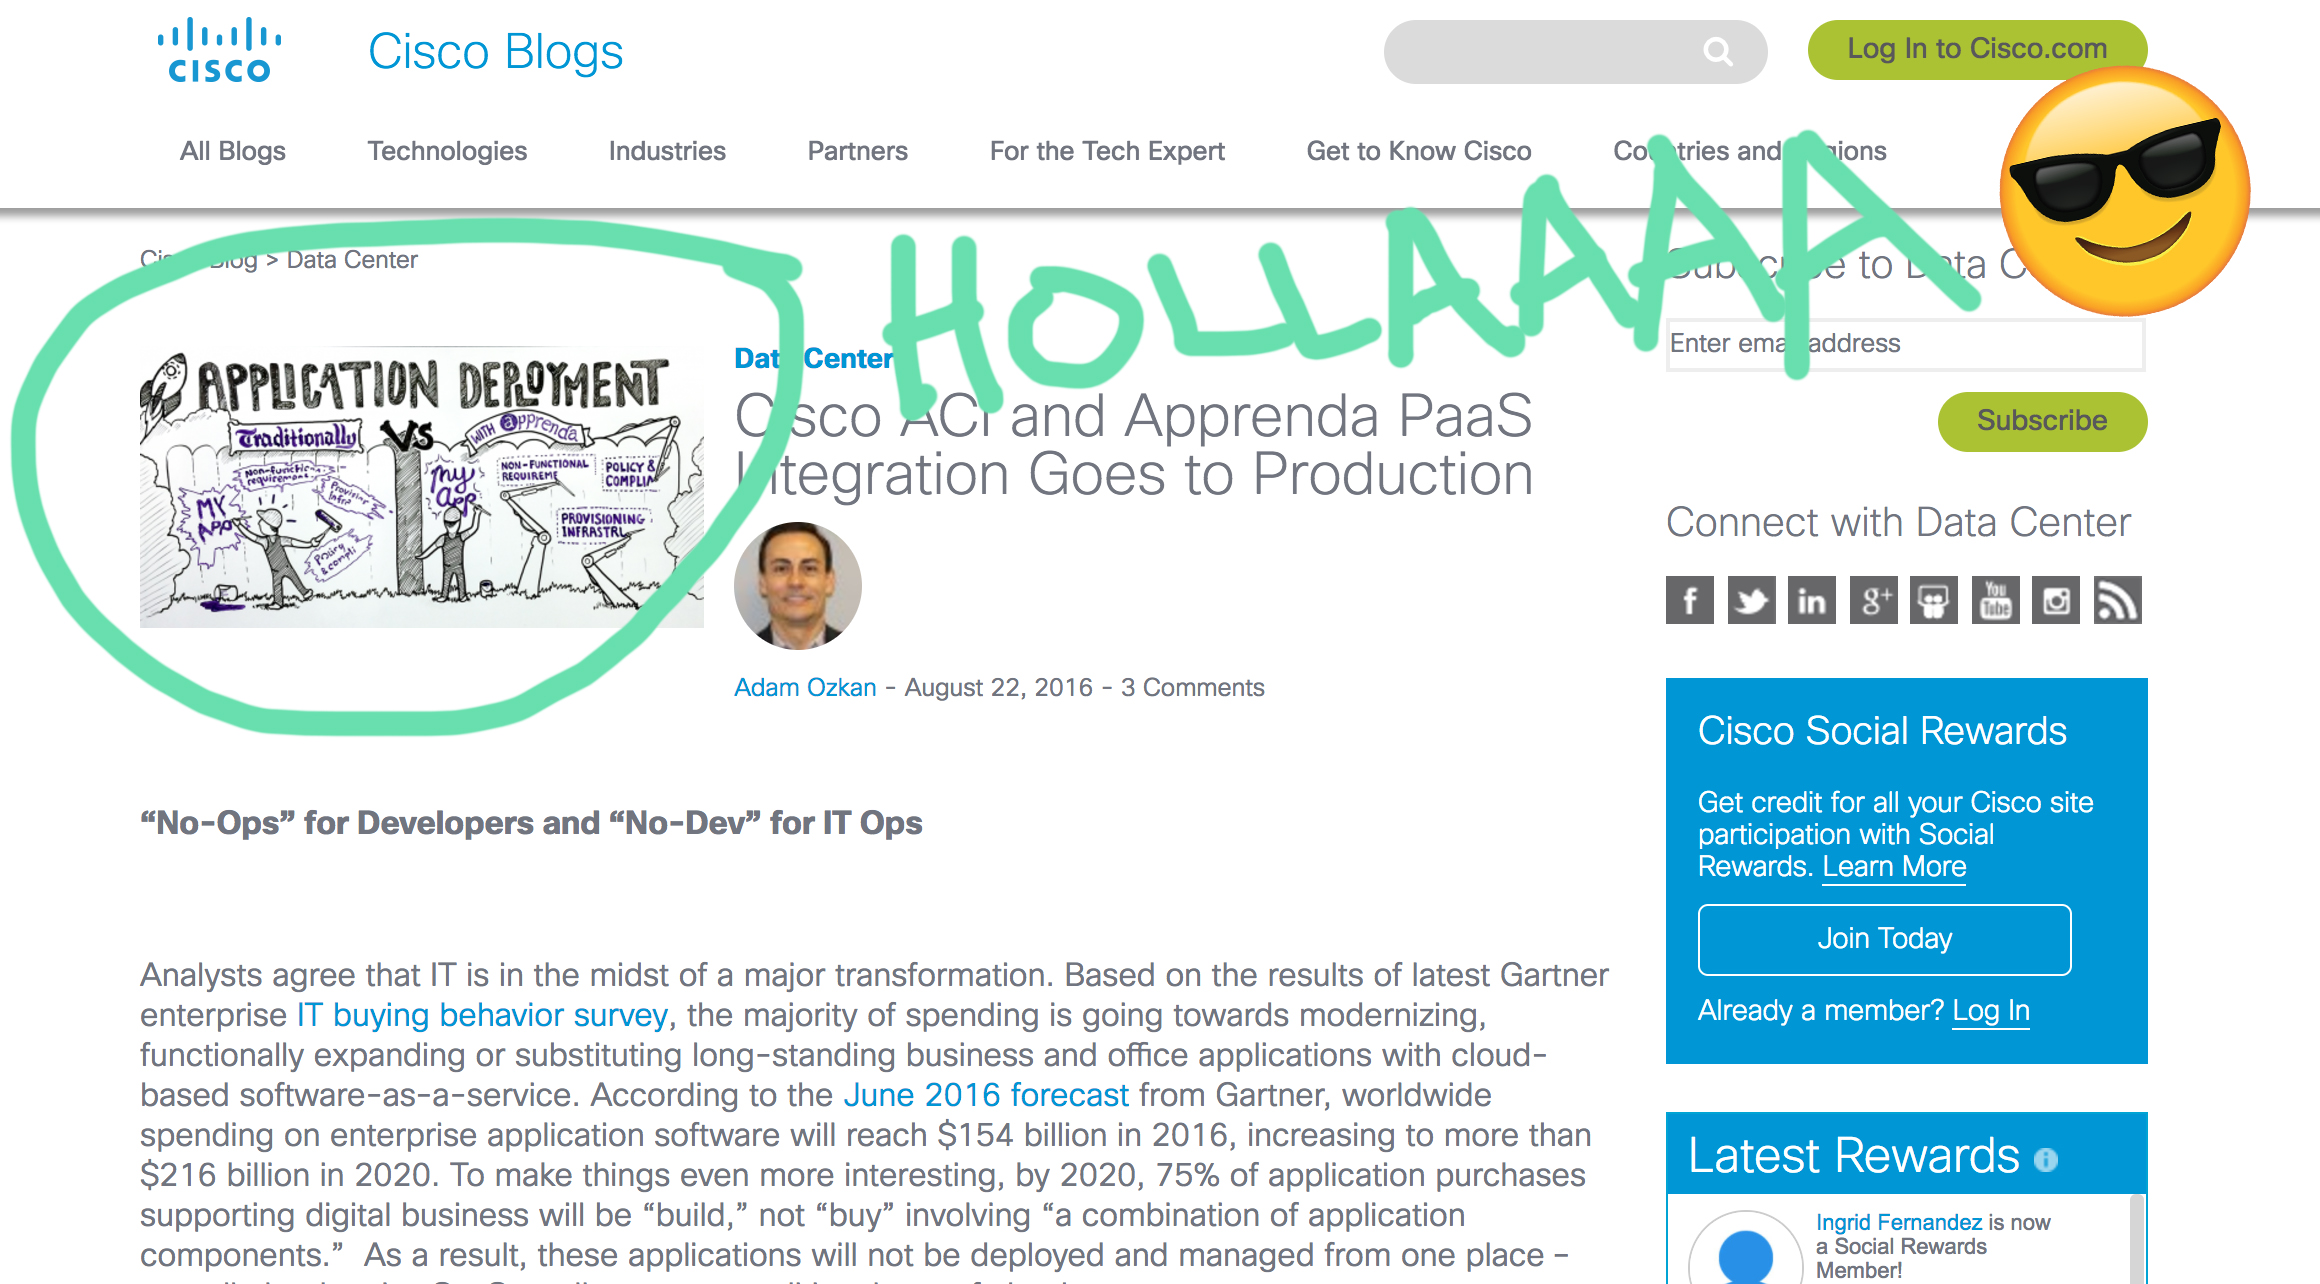 Cisco blog cameo appearance